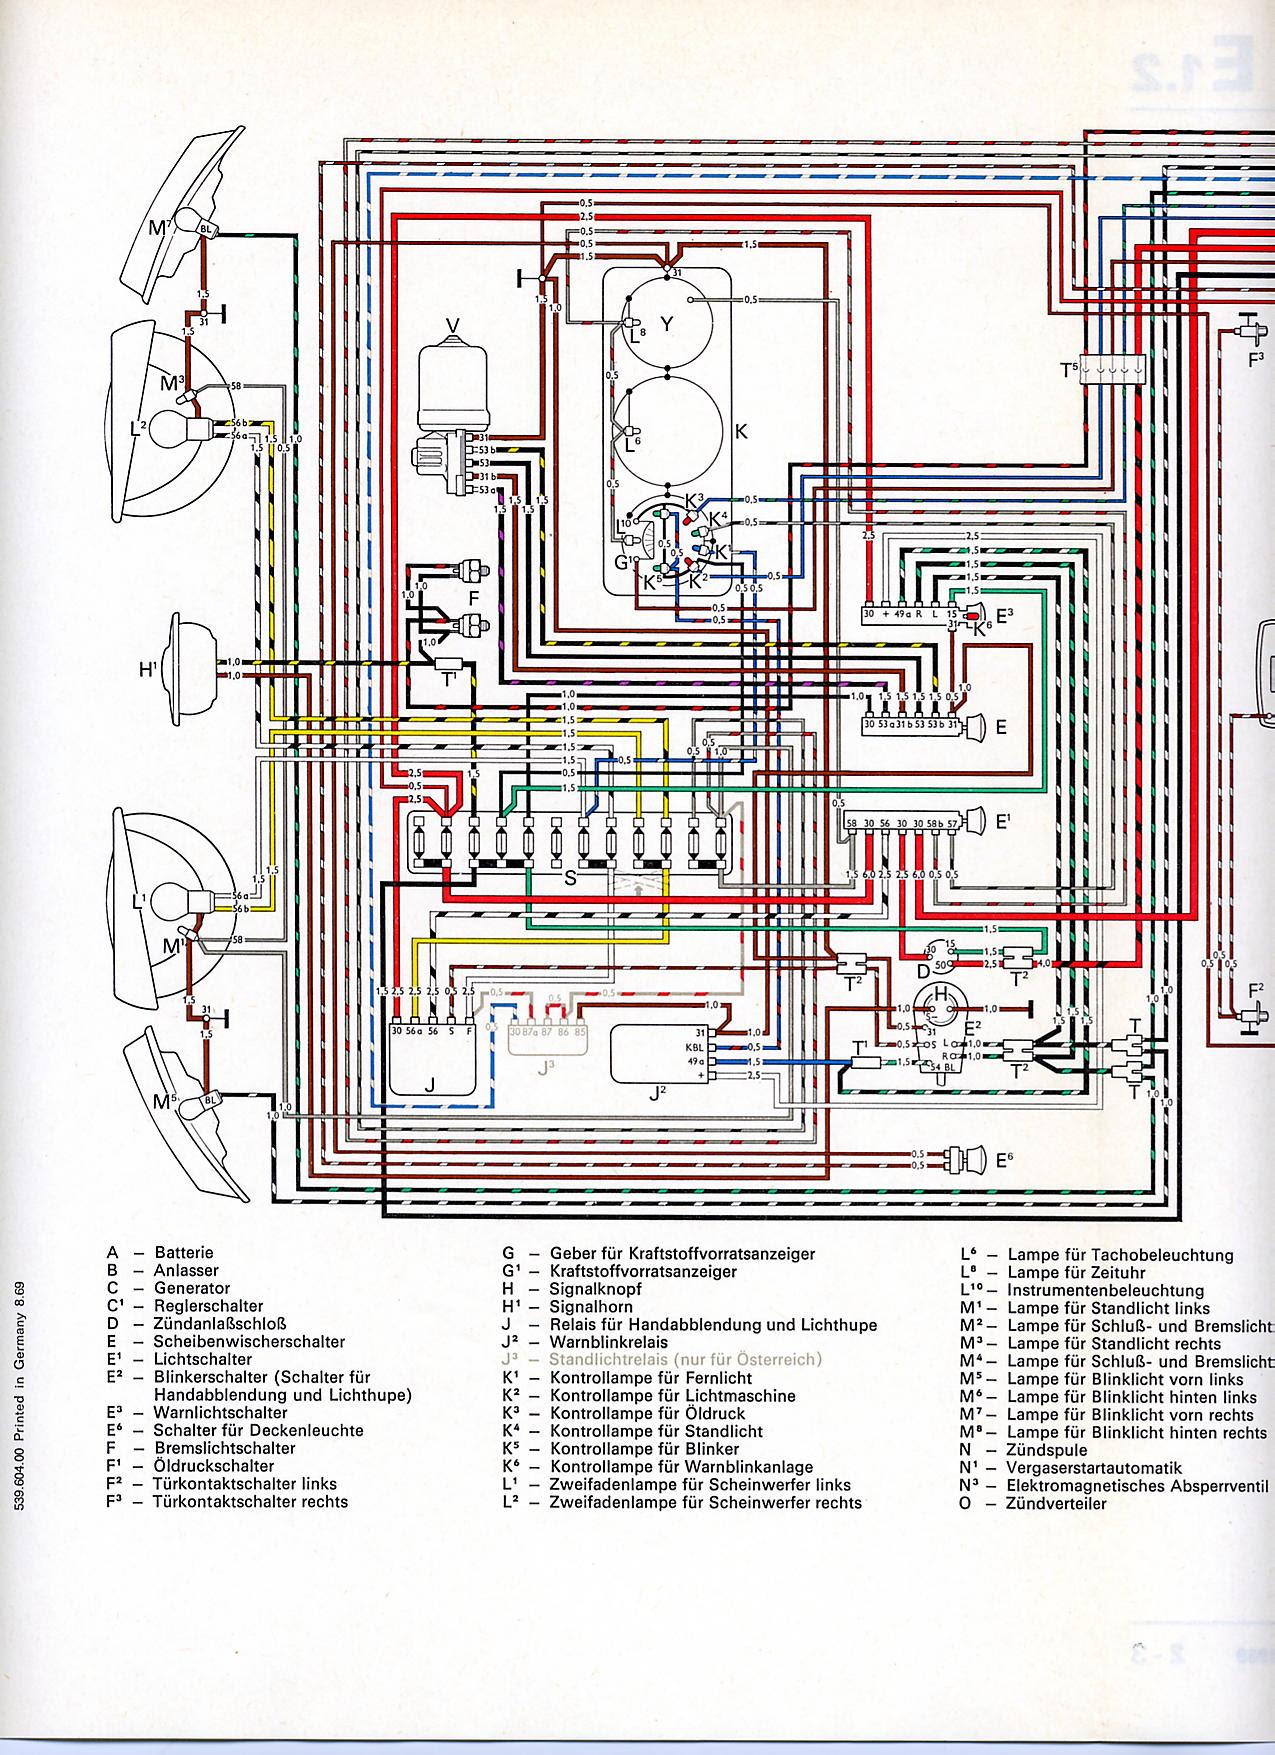 Maycintadamayantixibb  1974 Vw Beetle Wiring Diagram